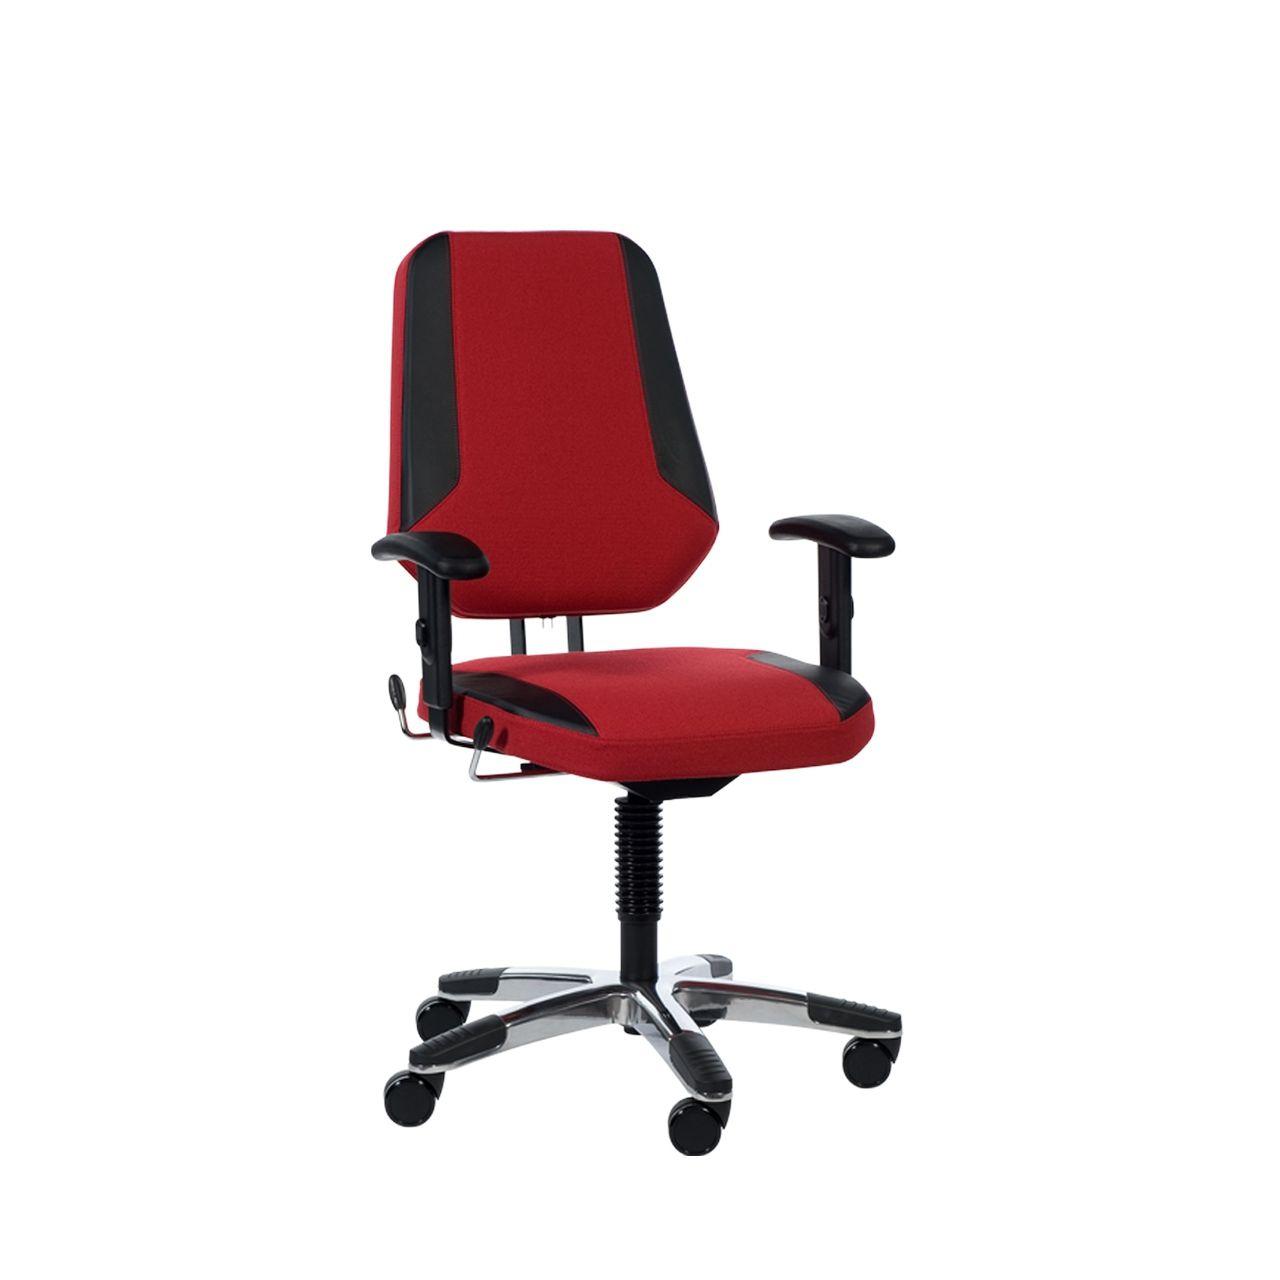 Maxx-line-small-bureaustoel